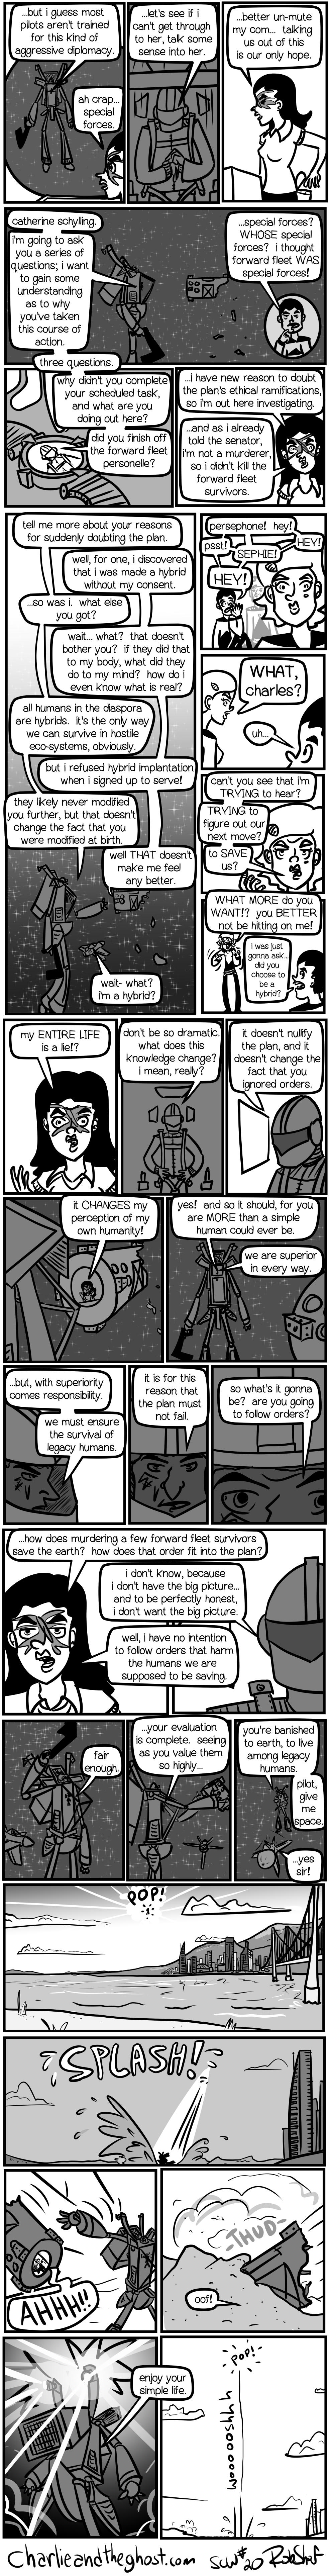 Spacechuck web 20